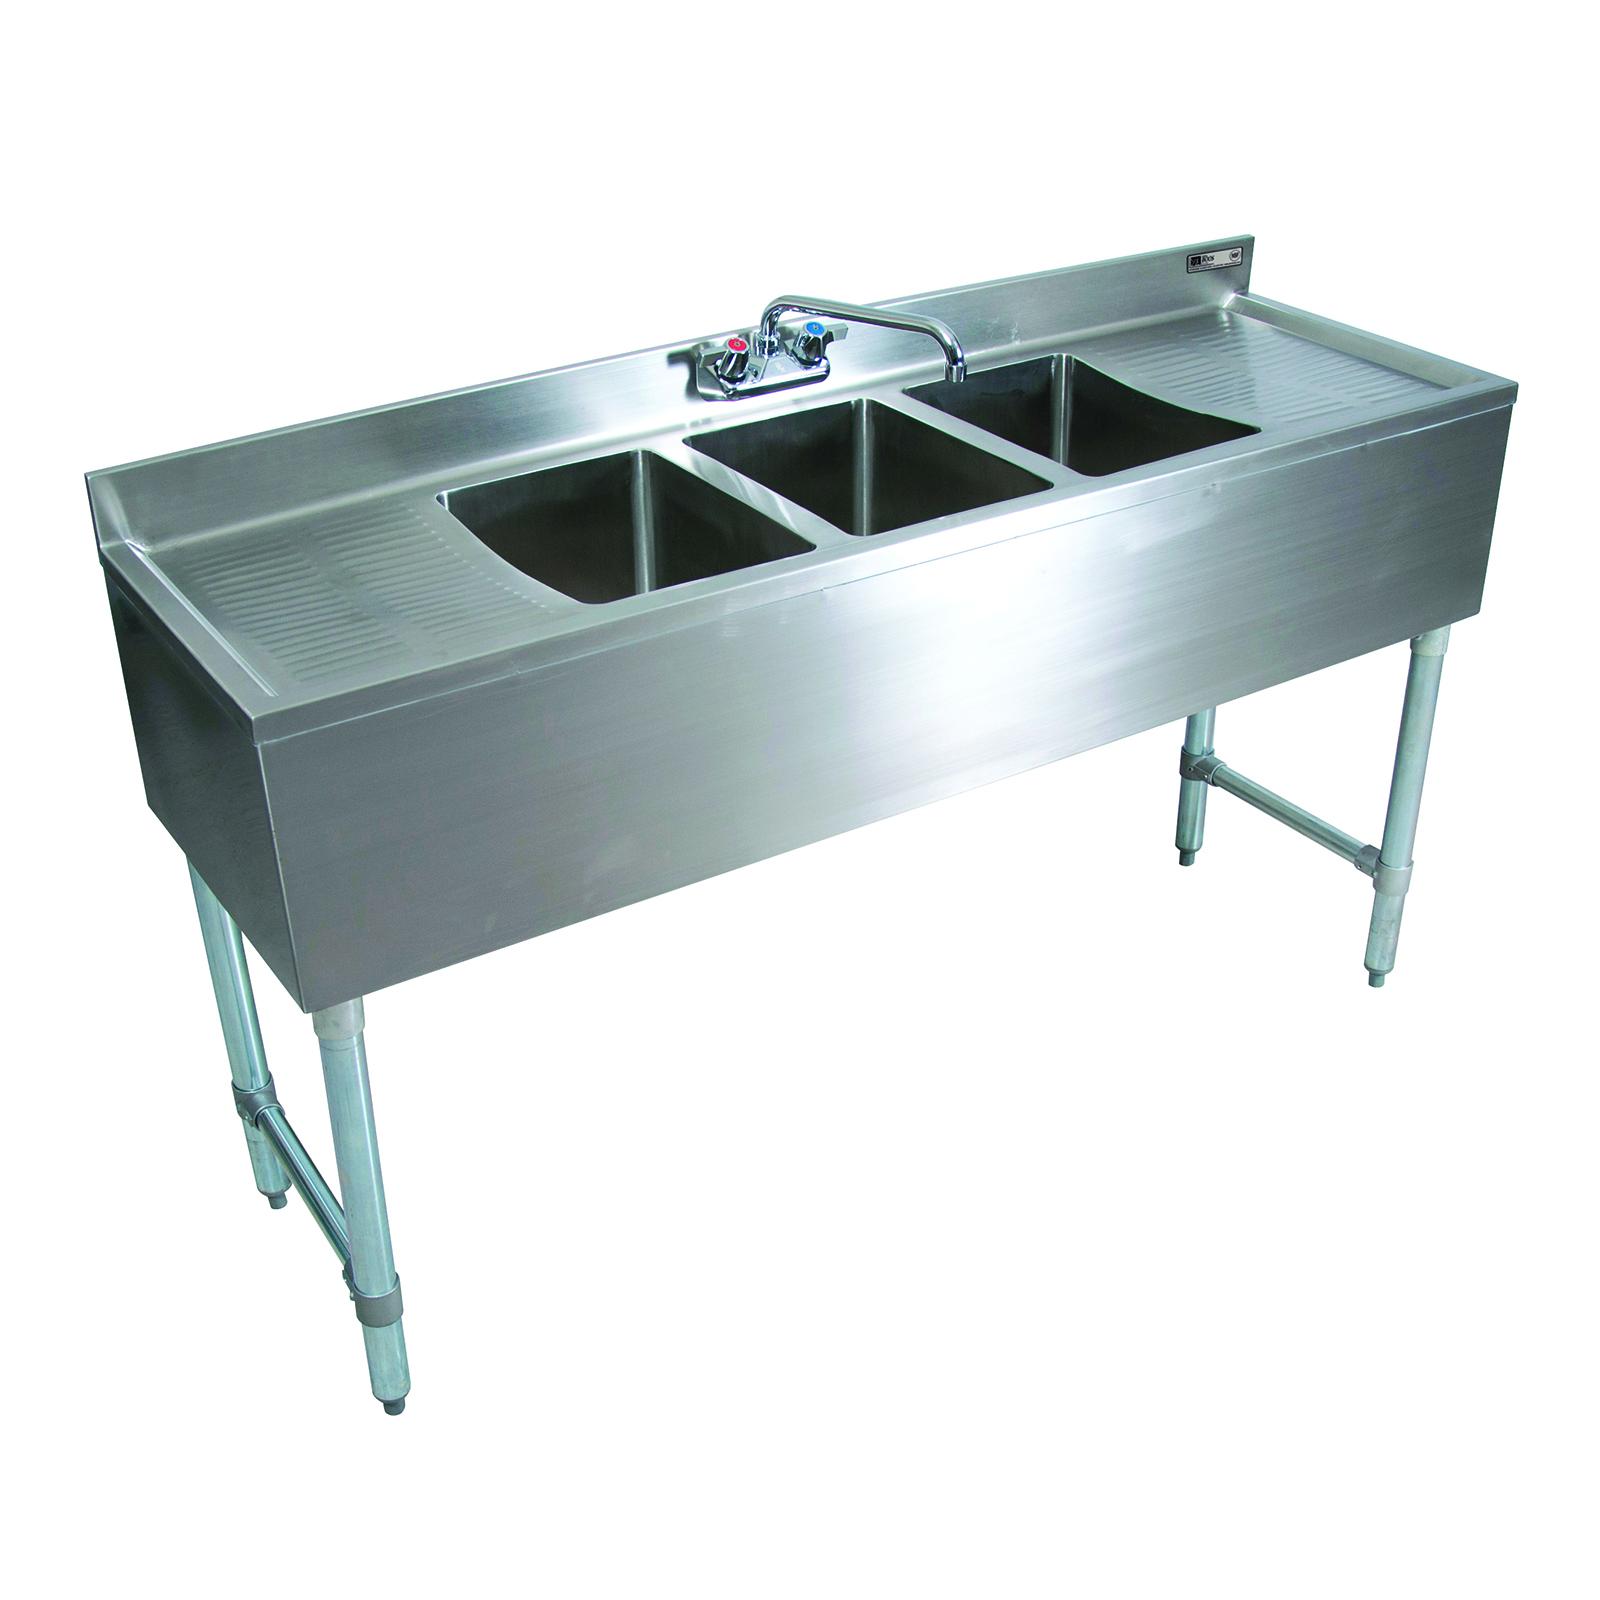 John Boos EUB2S36SL-1RD underbar sink units